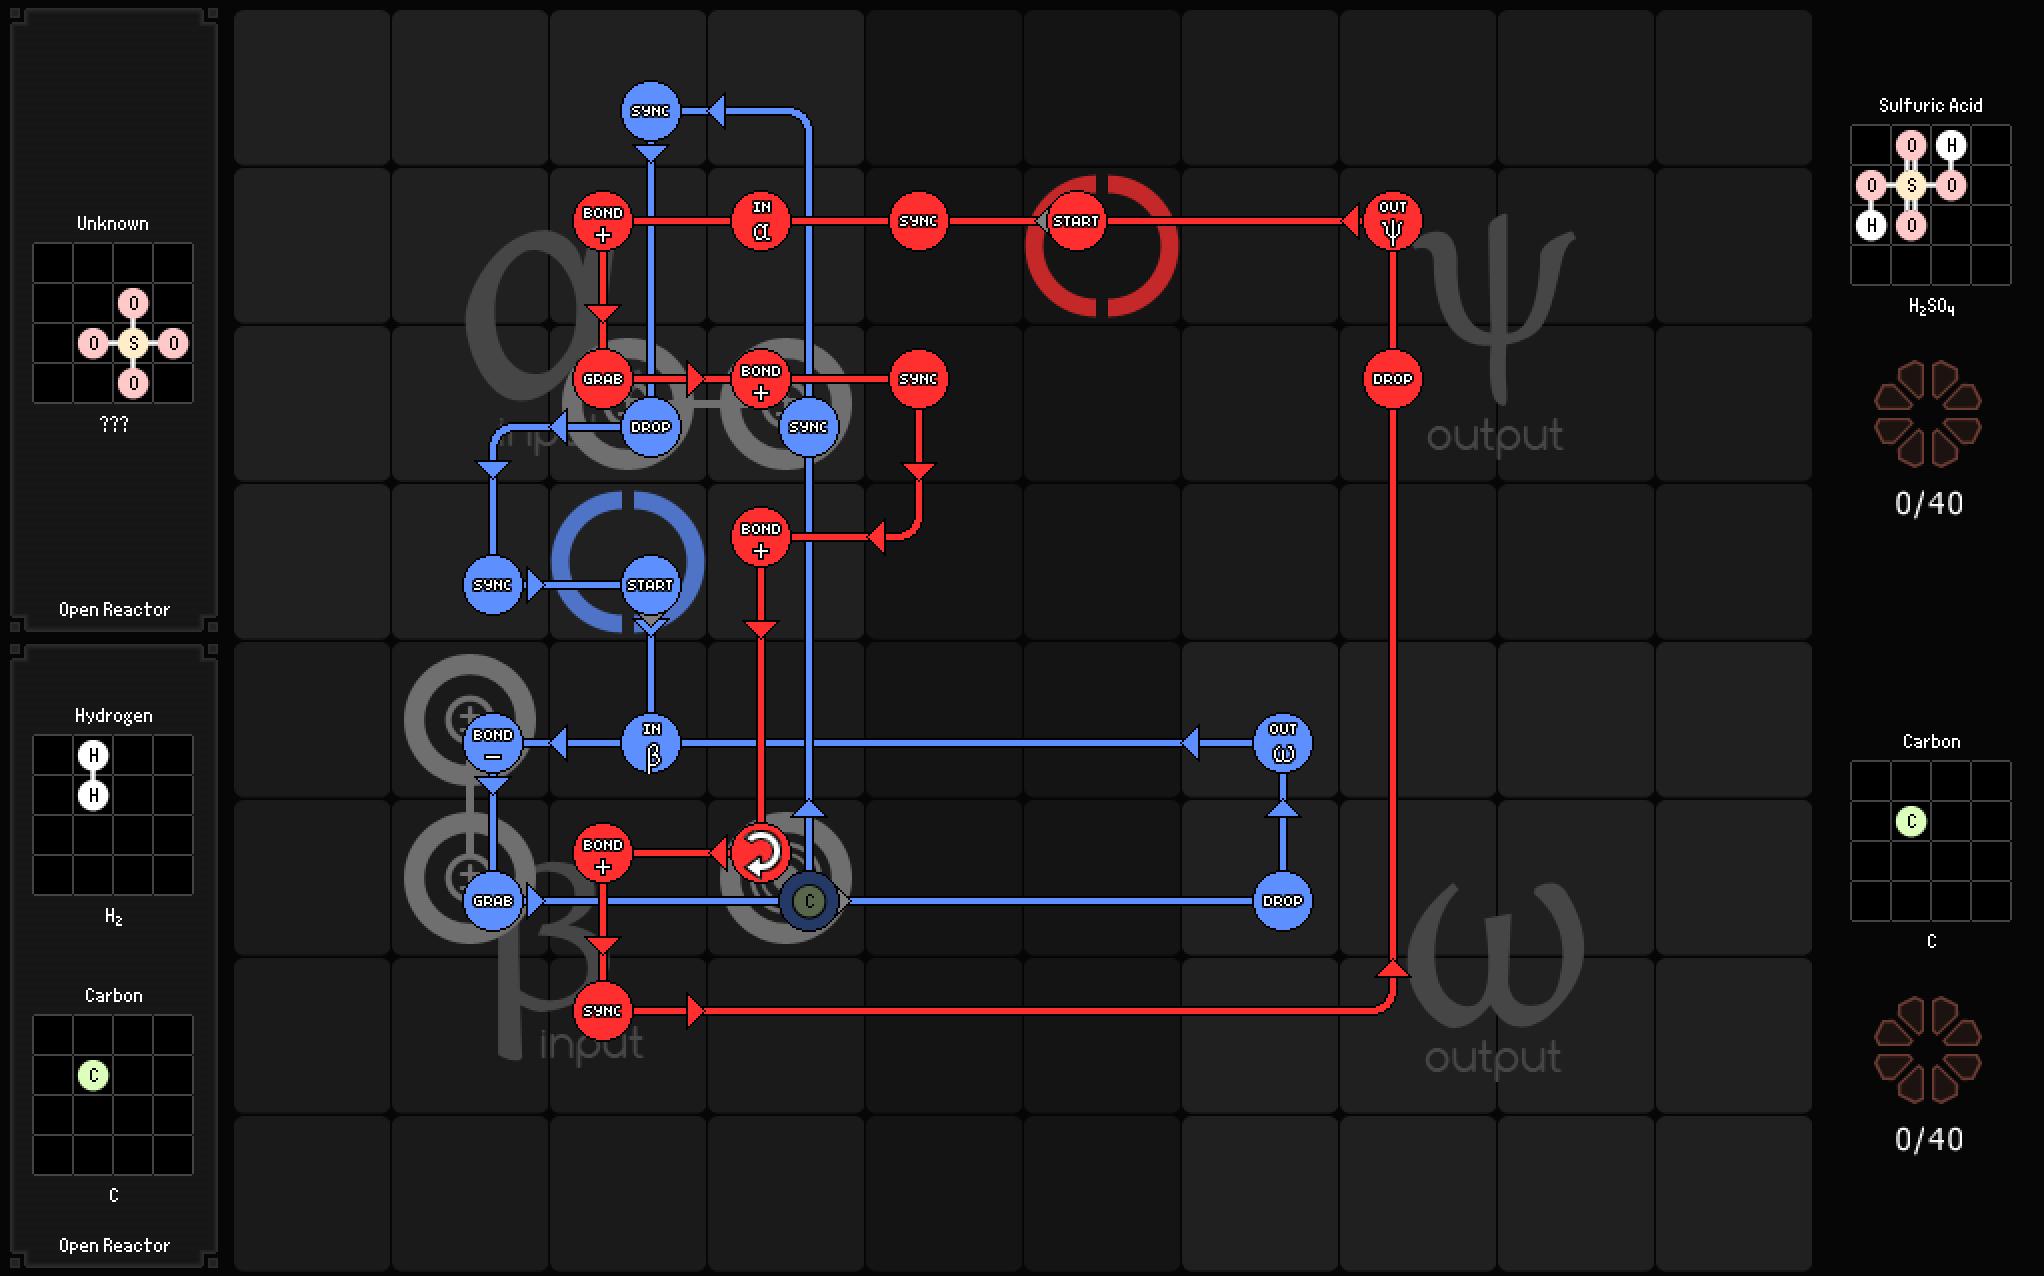 1_Story_Mode/4_Alkonost/SpaceChem-4.6.a/Reactor_4.png